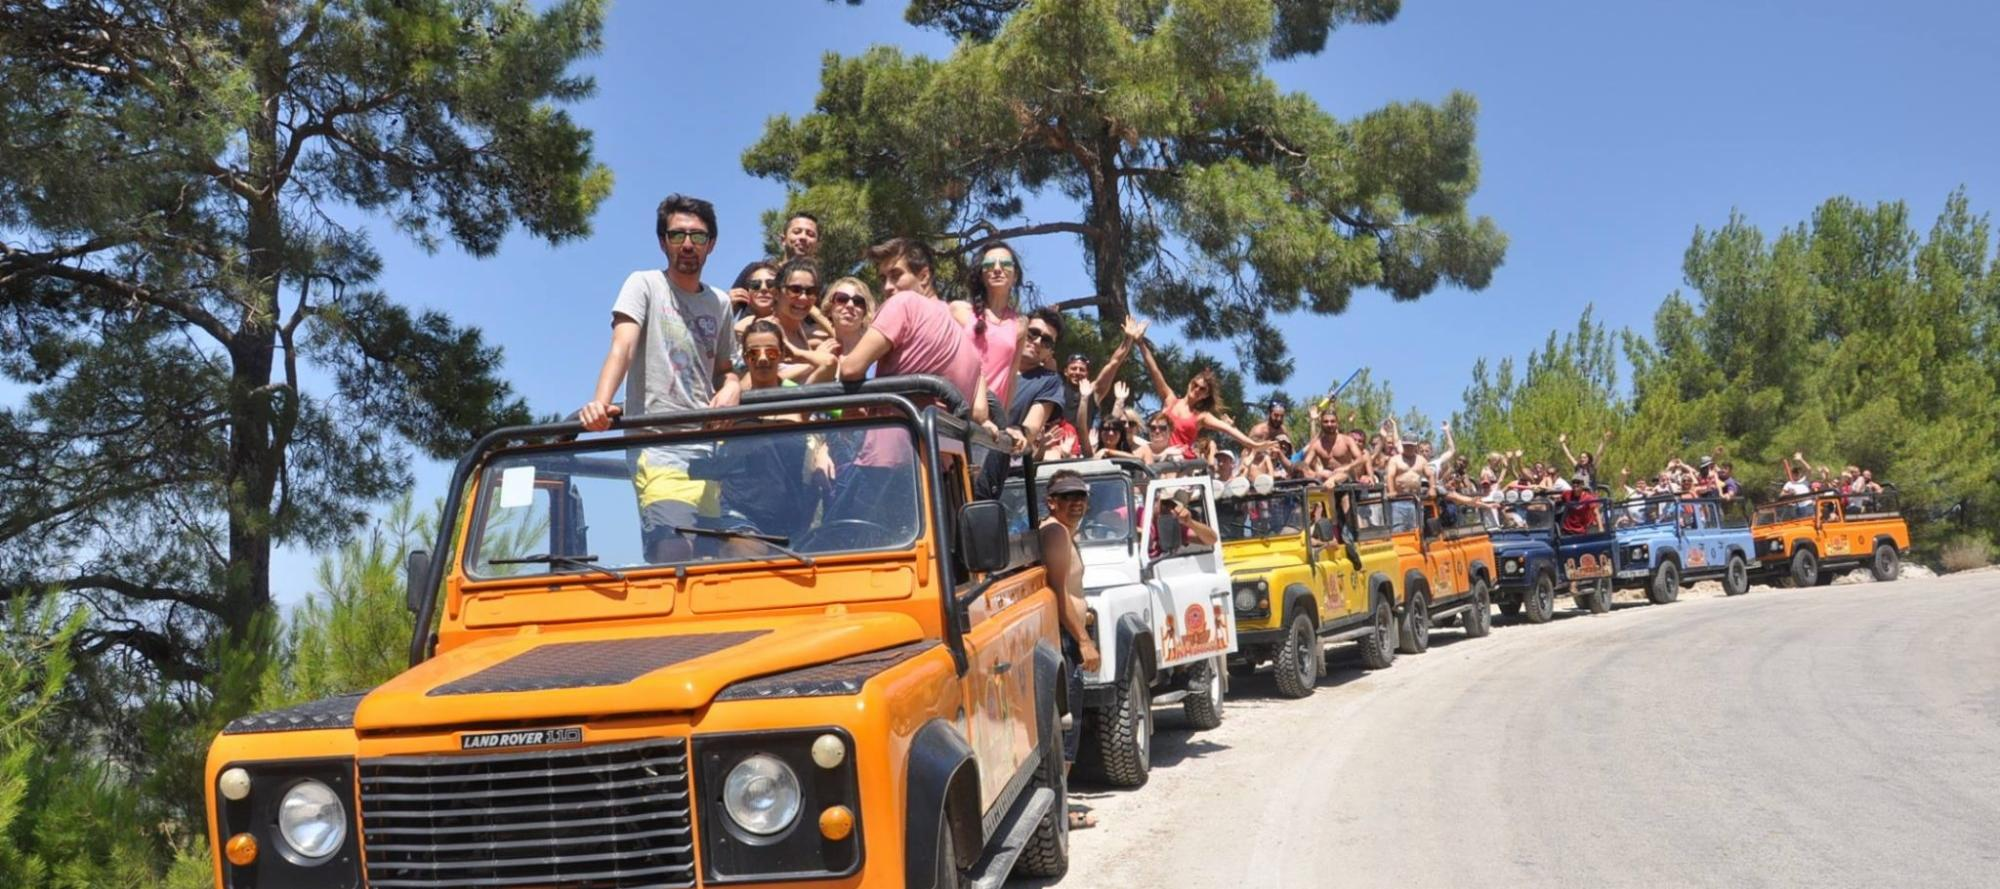 Jeep safari tour in Kusadasi, Turkey   Best day trips in Kusadasi